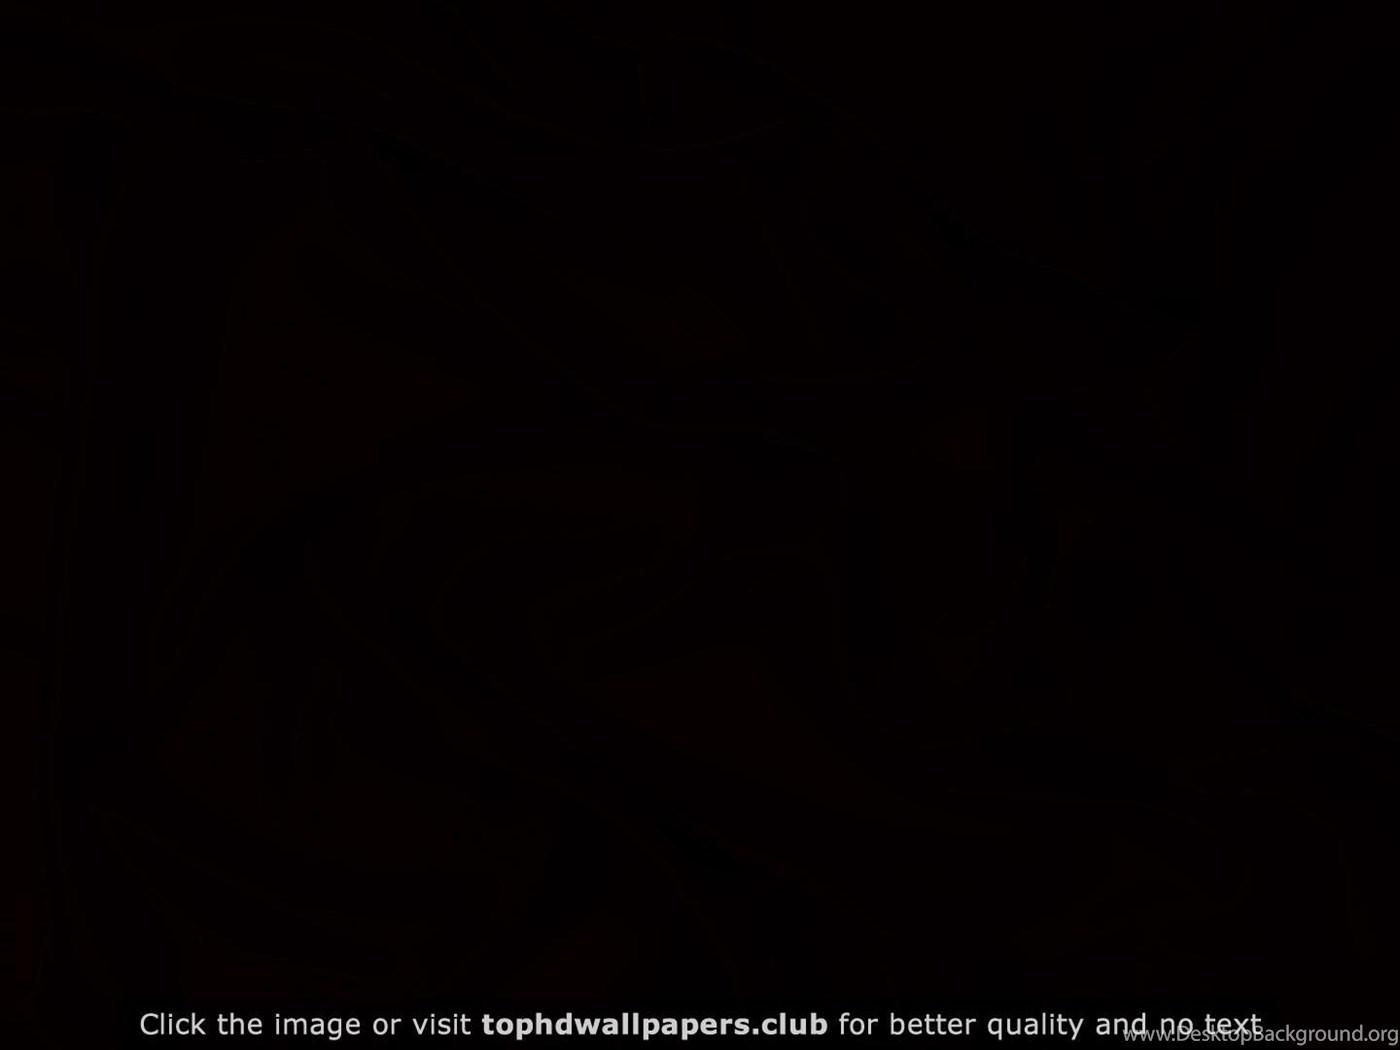 S Black Cool Windows Desktop Dark 4k Or Hd Wallpapers For